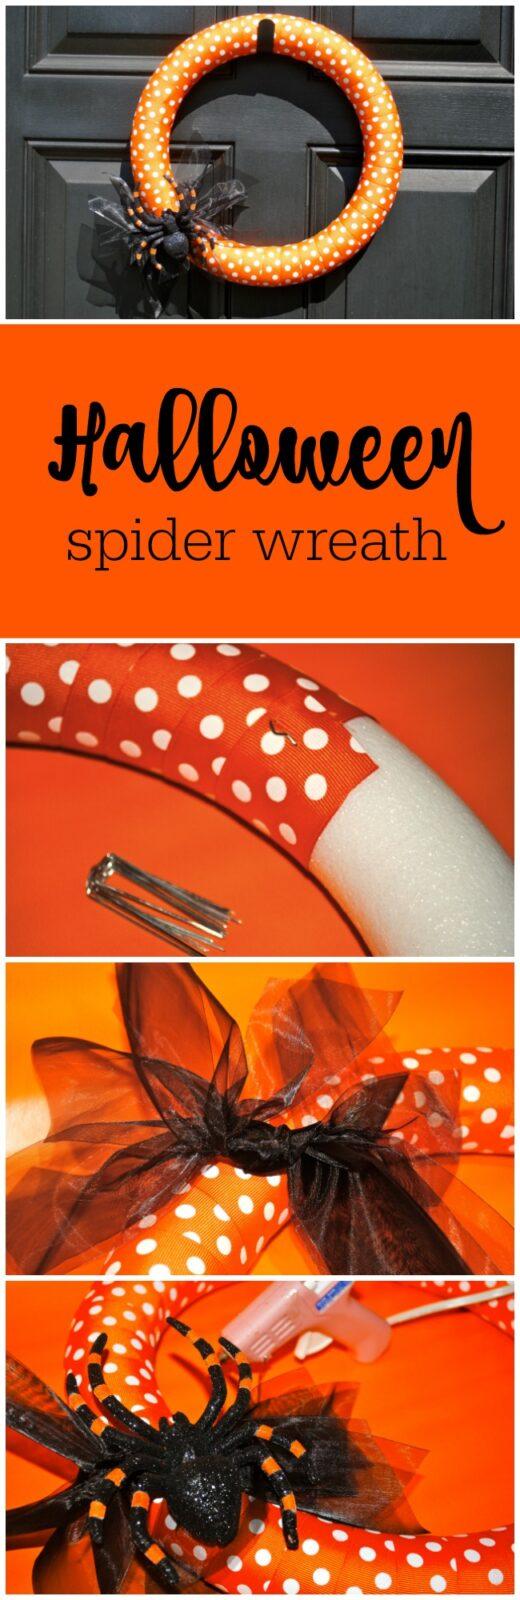 Halloween spider wreath by The Party Teacher